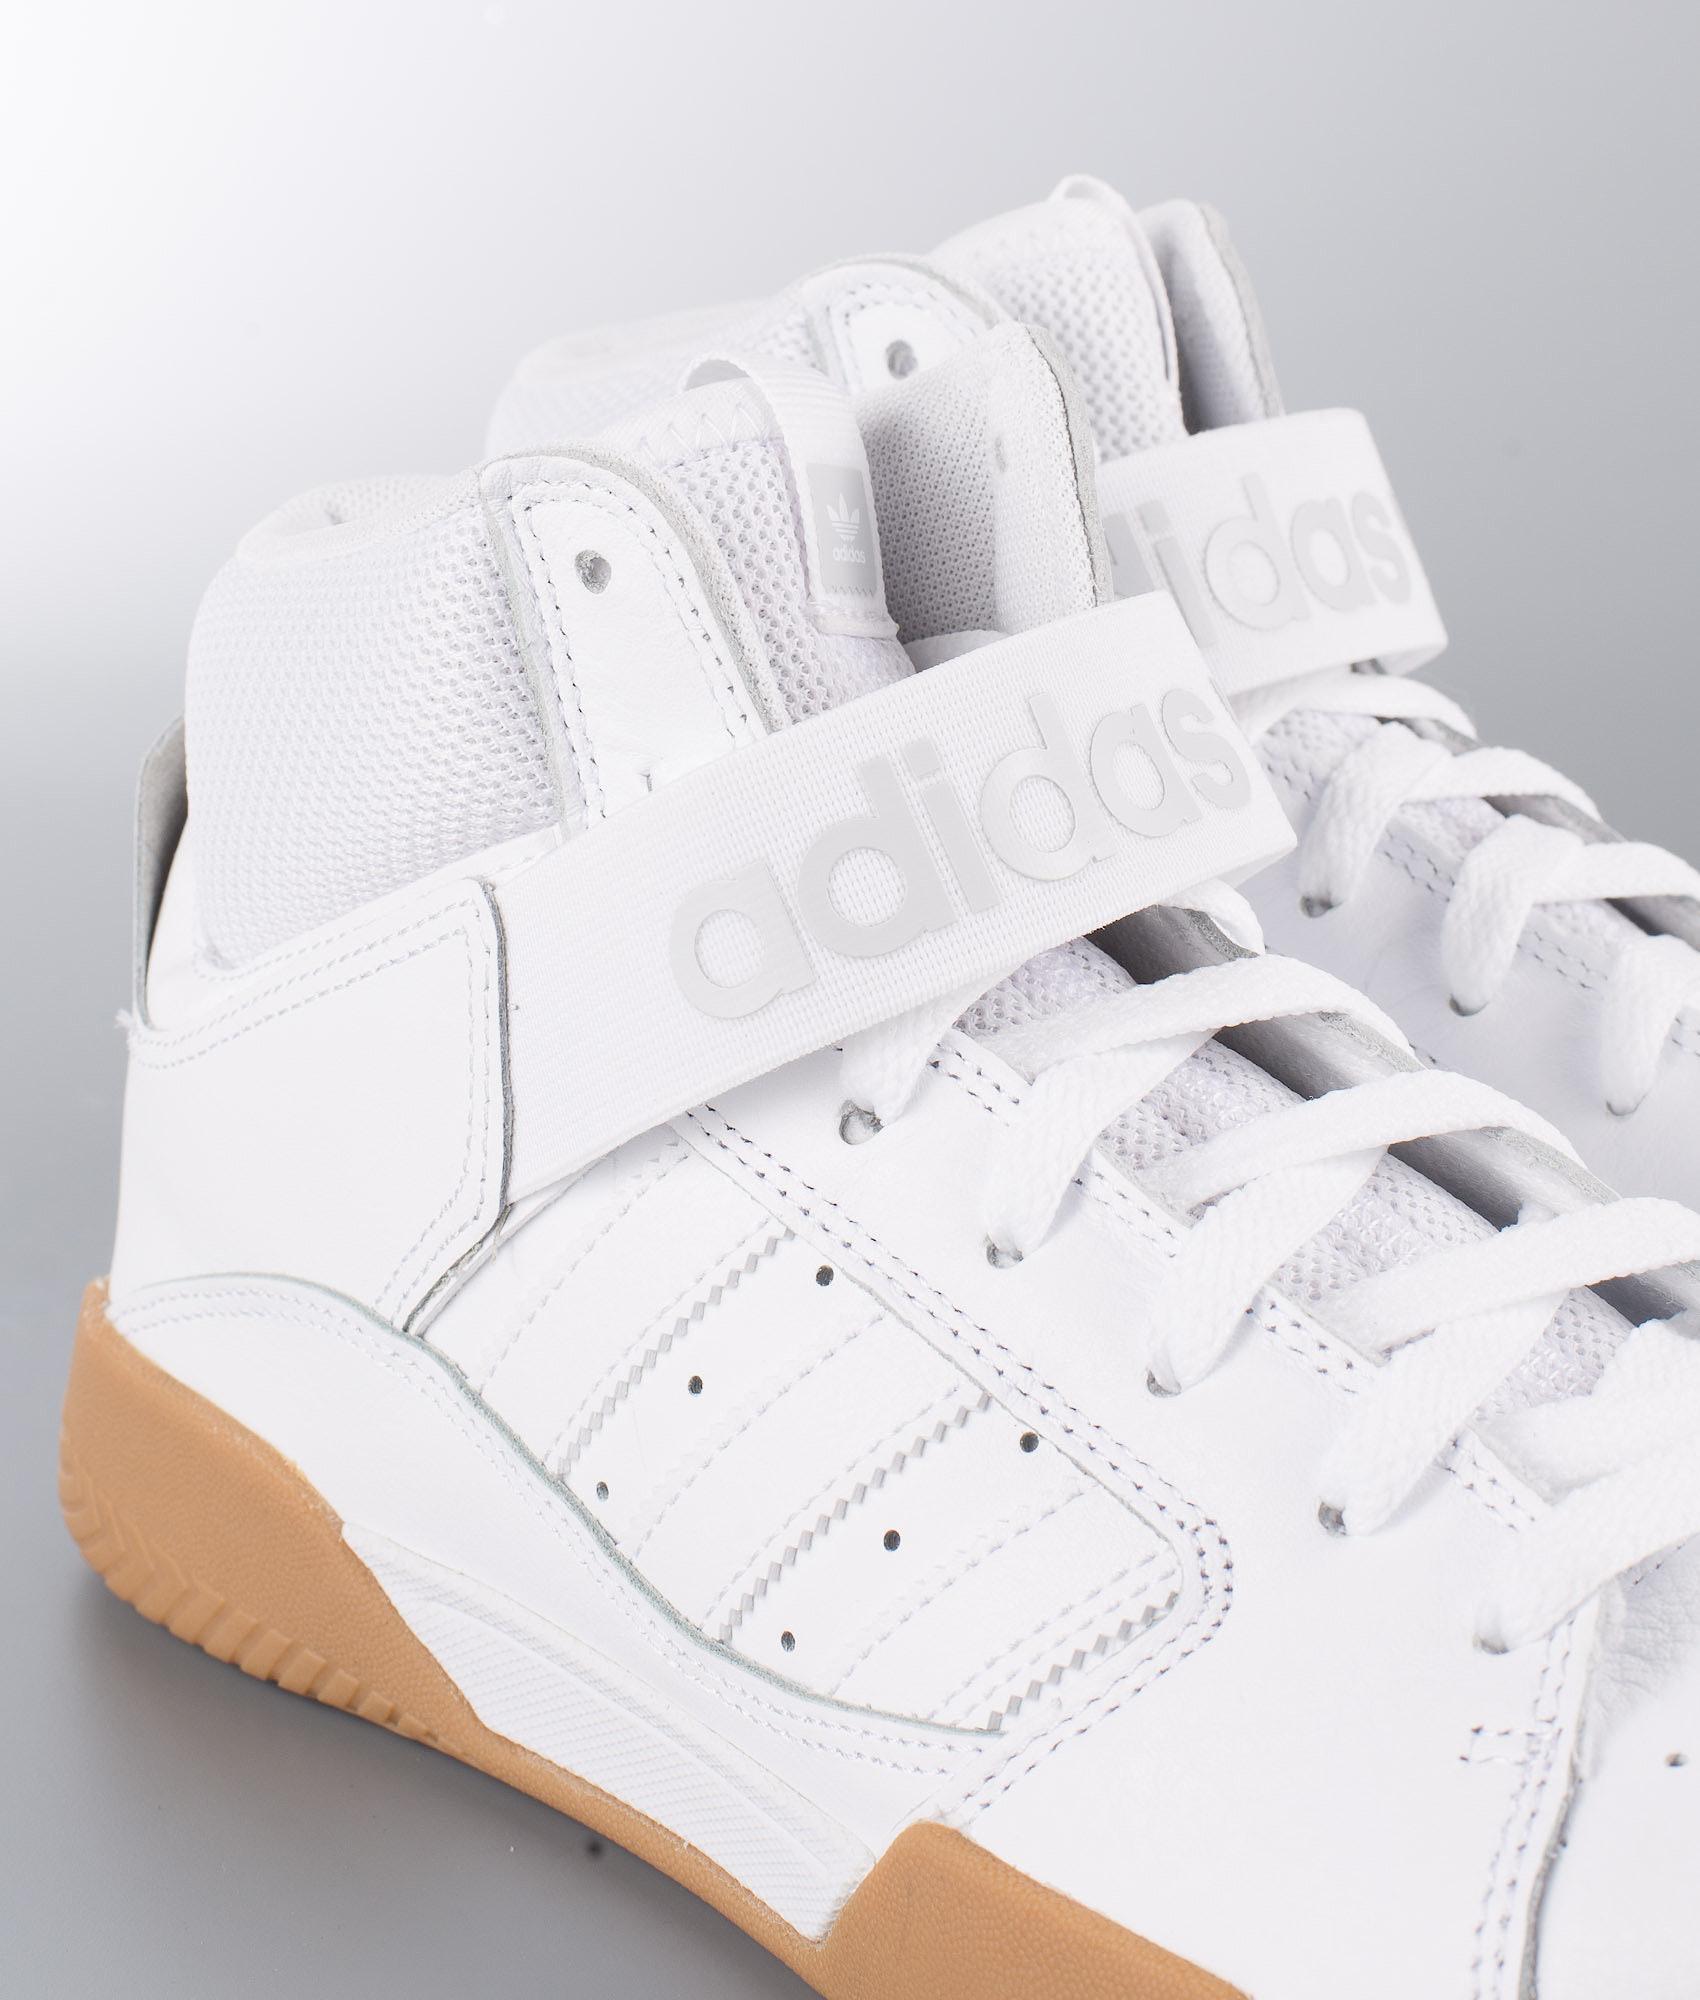 3a99f4ccf45 Adidas Skateboarding VRX Mid Shoes Ftwr White/Ftwr White/Gum4 ...